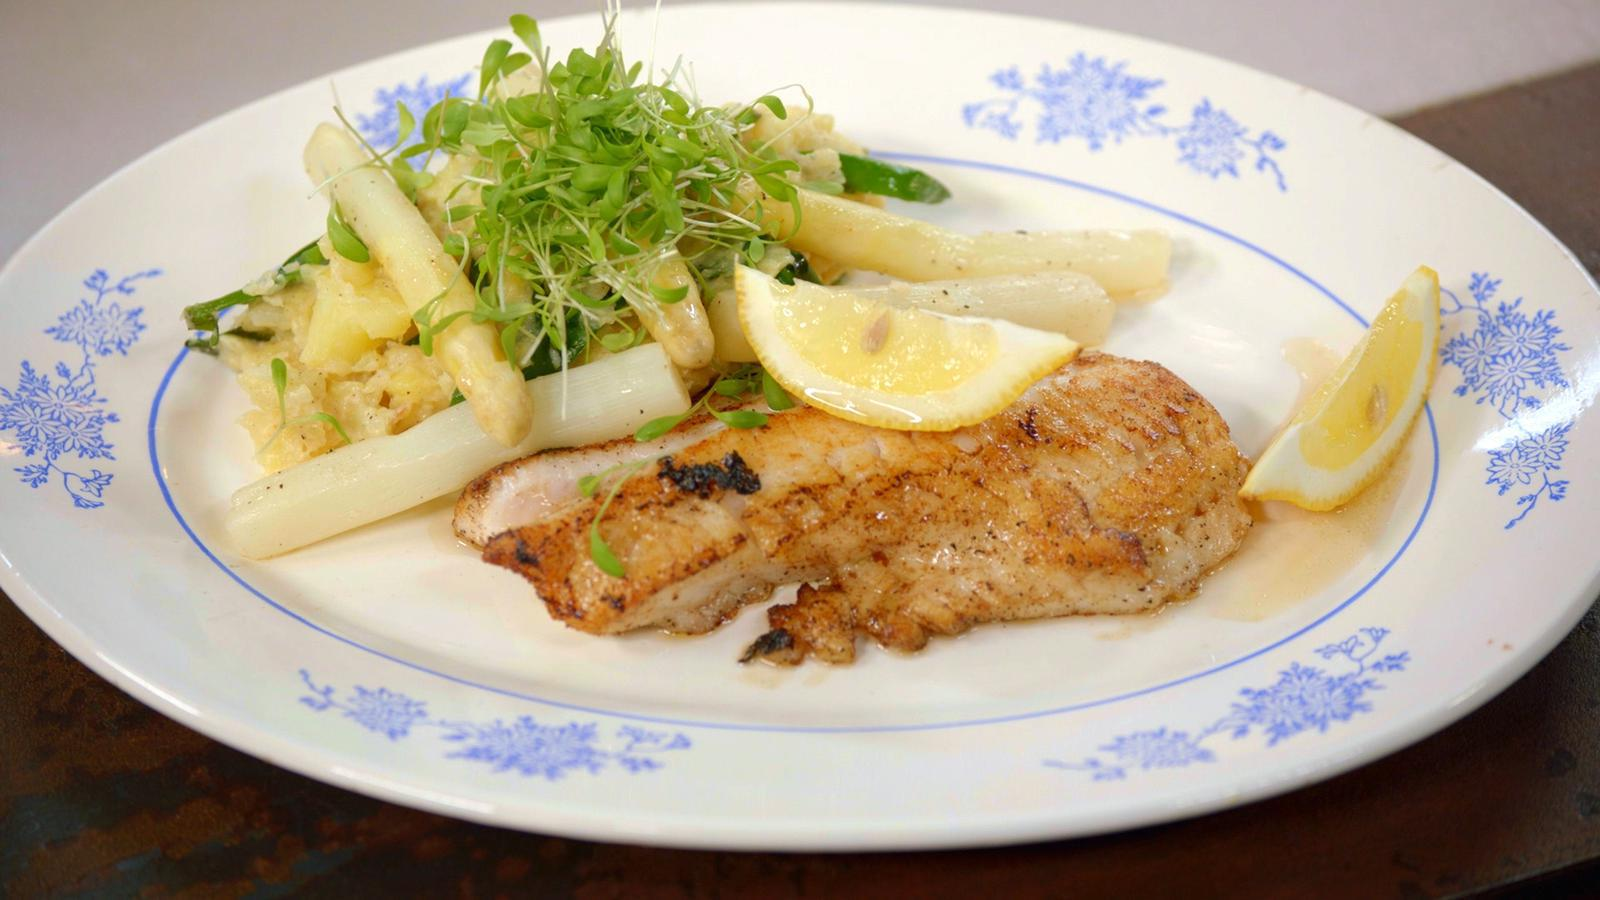 Gebakken roodbaars met geplette aardappel, jonge bloemkool, asperges en lamsoor